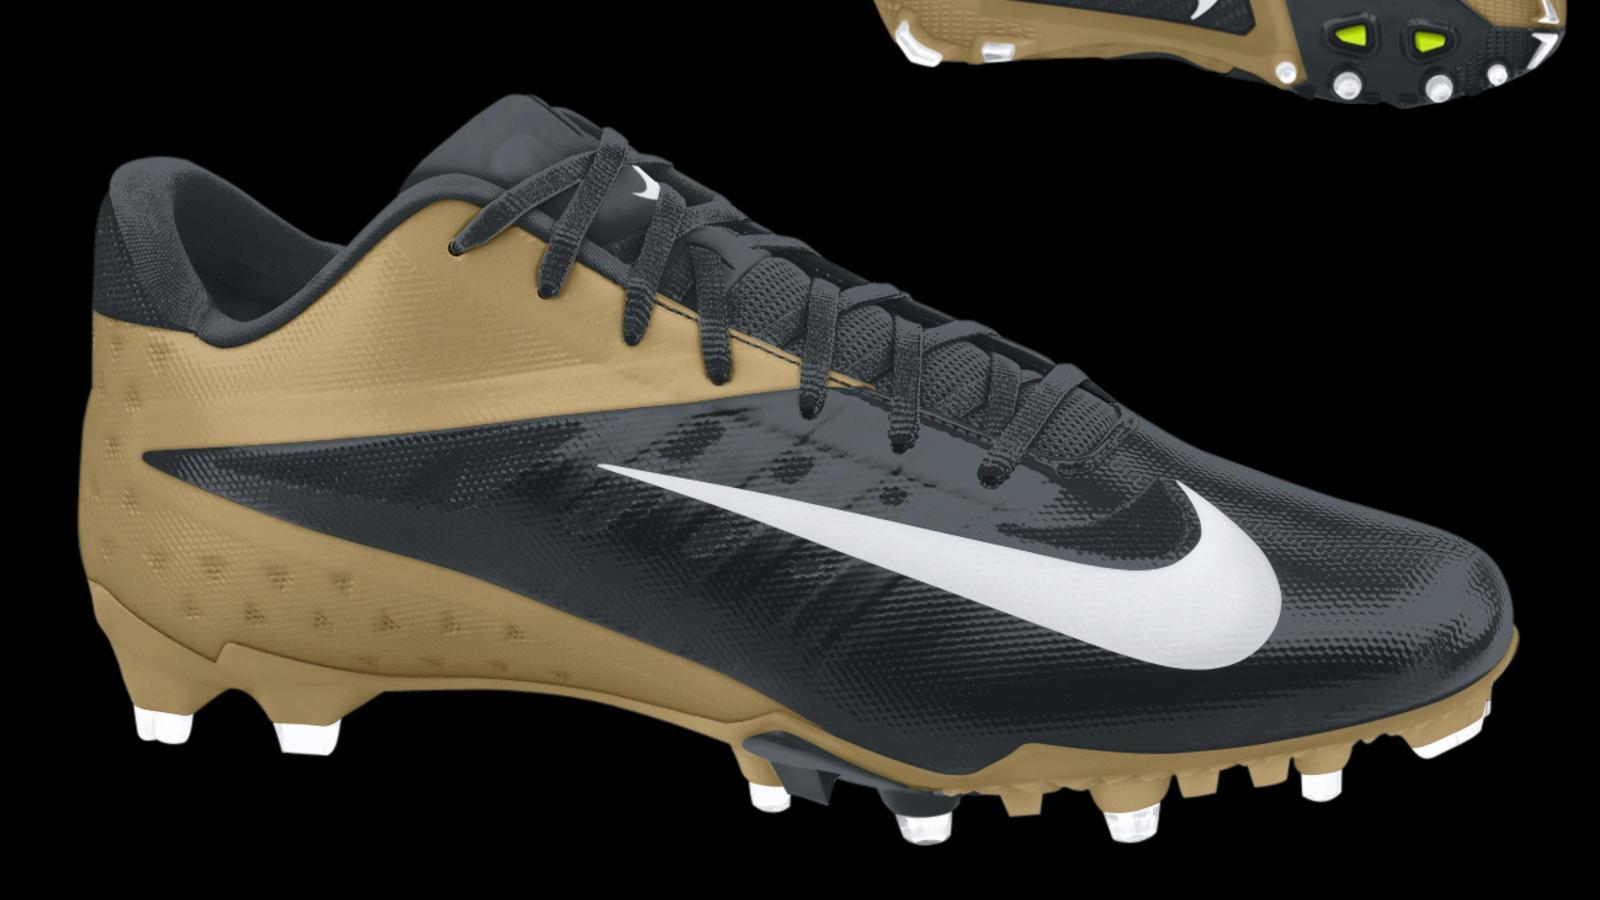 new arrival cce34 ac2e0 New Orleans Saints 2012 Nike Football Uniform - Nike News